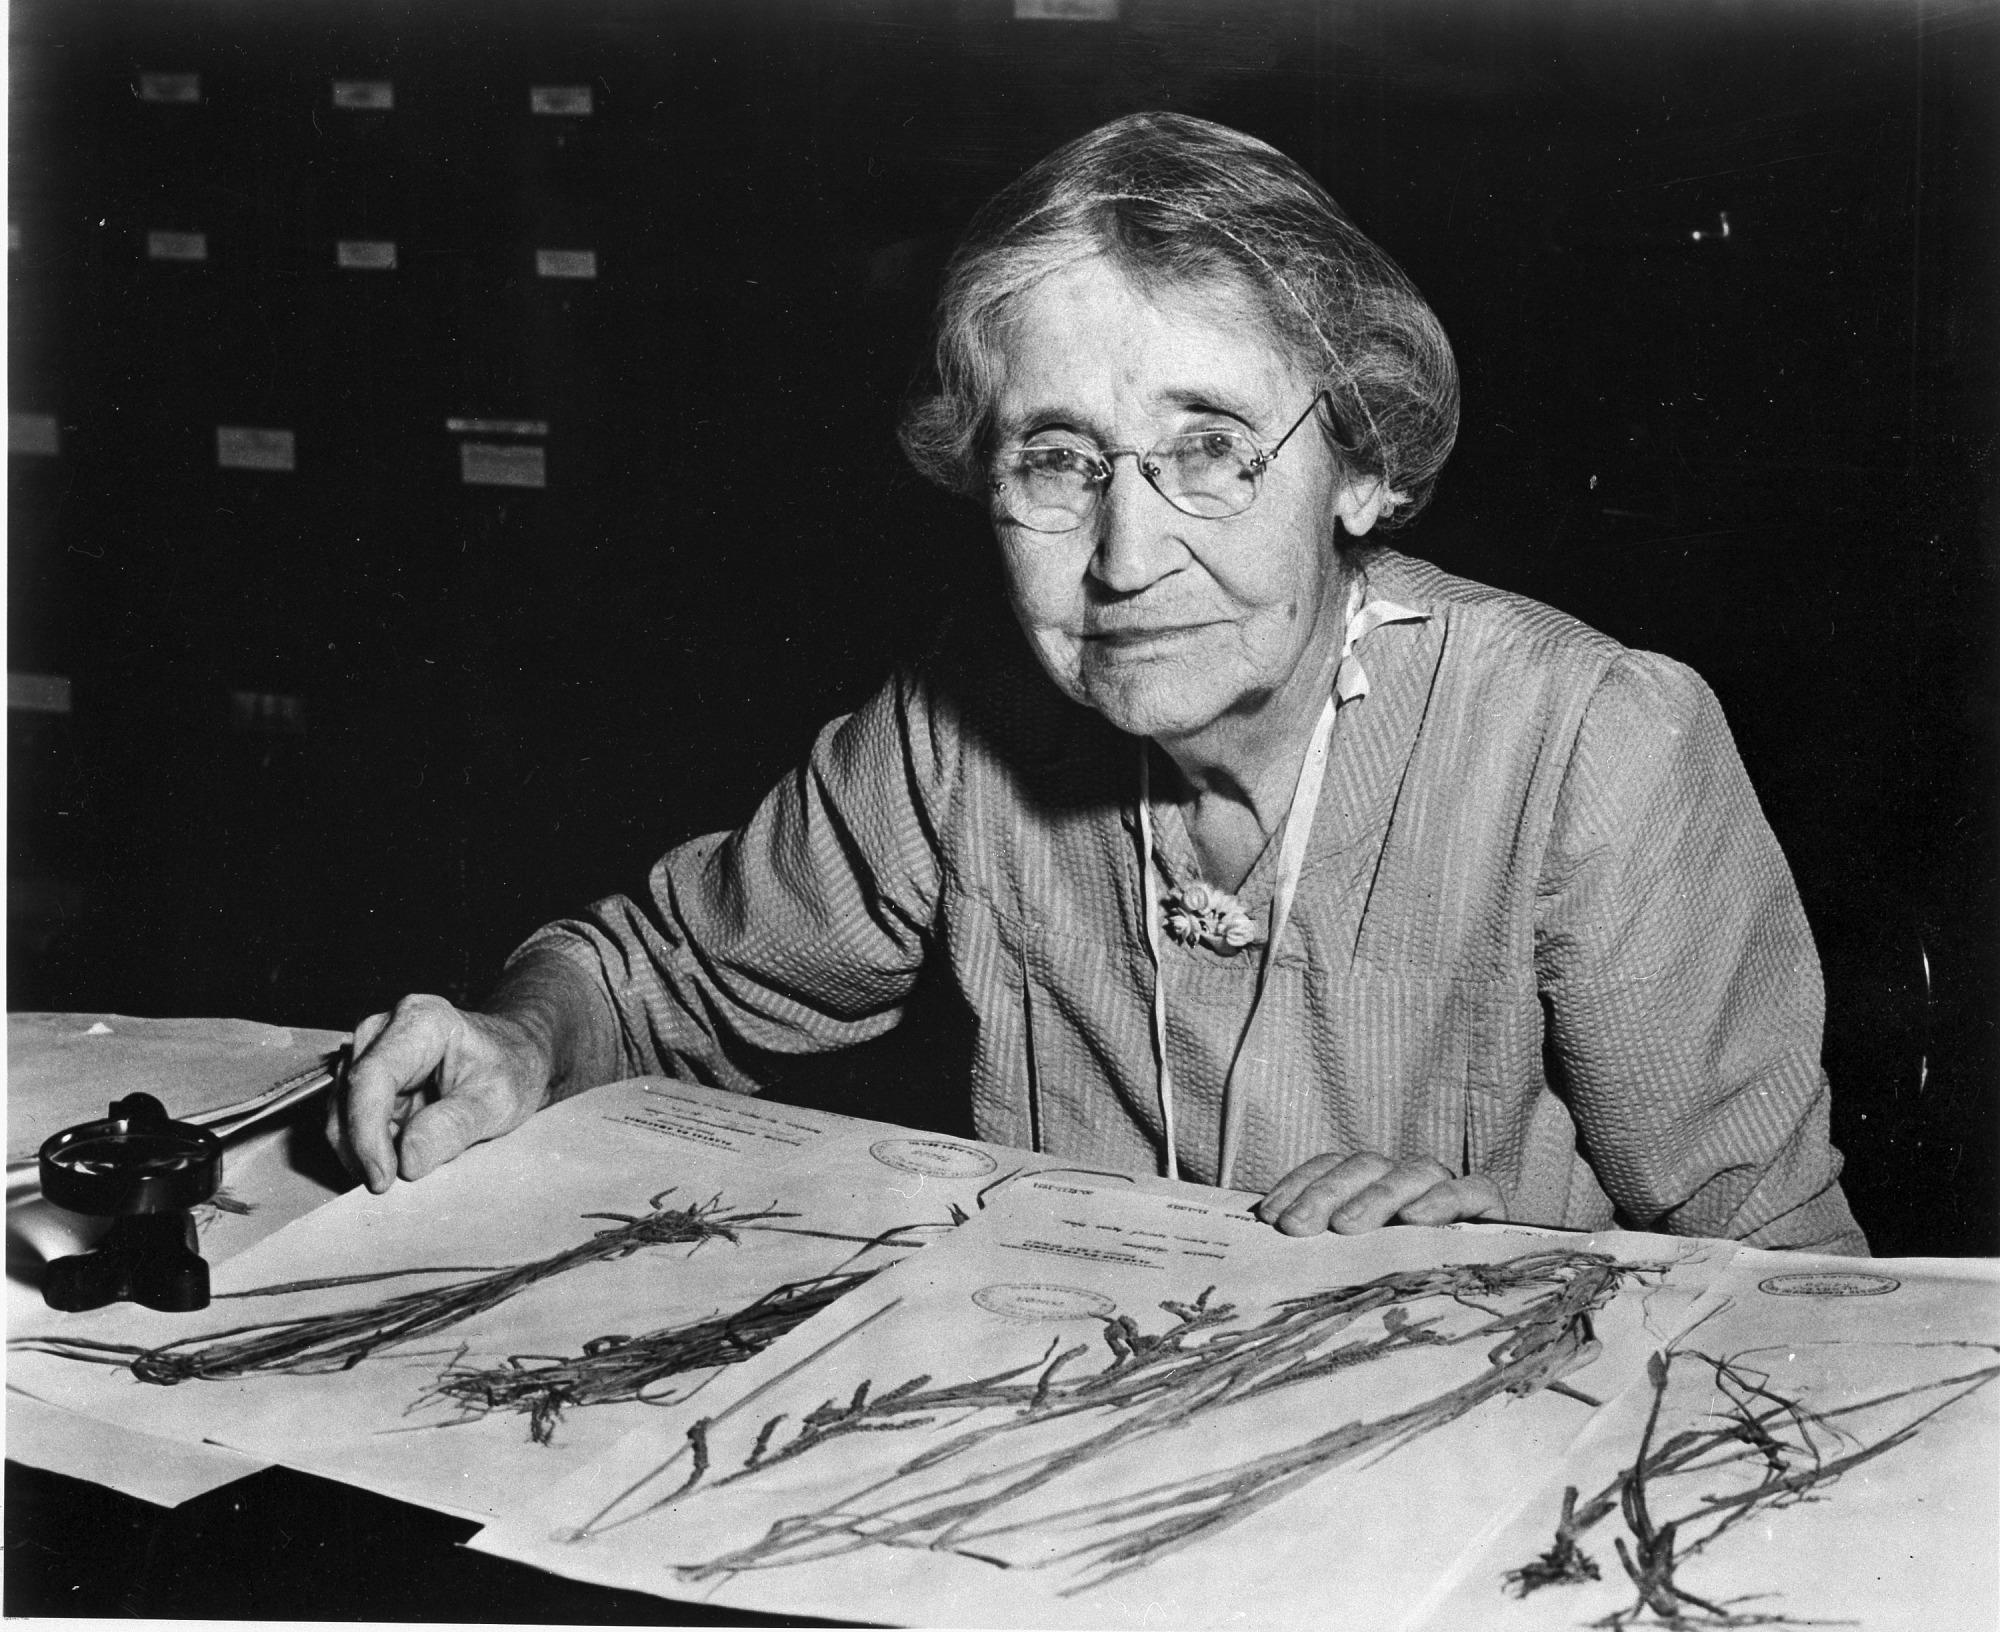 Mary Agnes Chase, Botanist